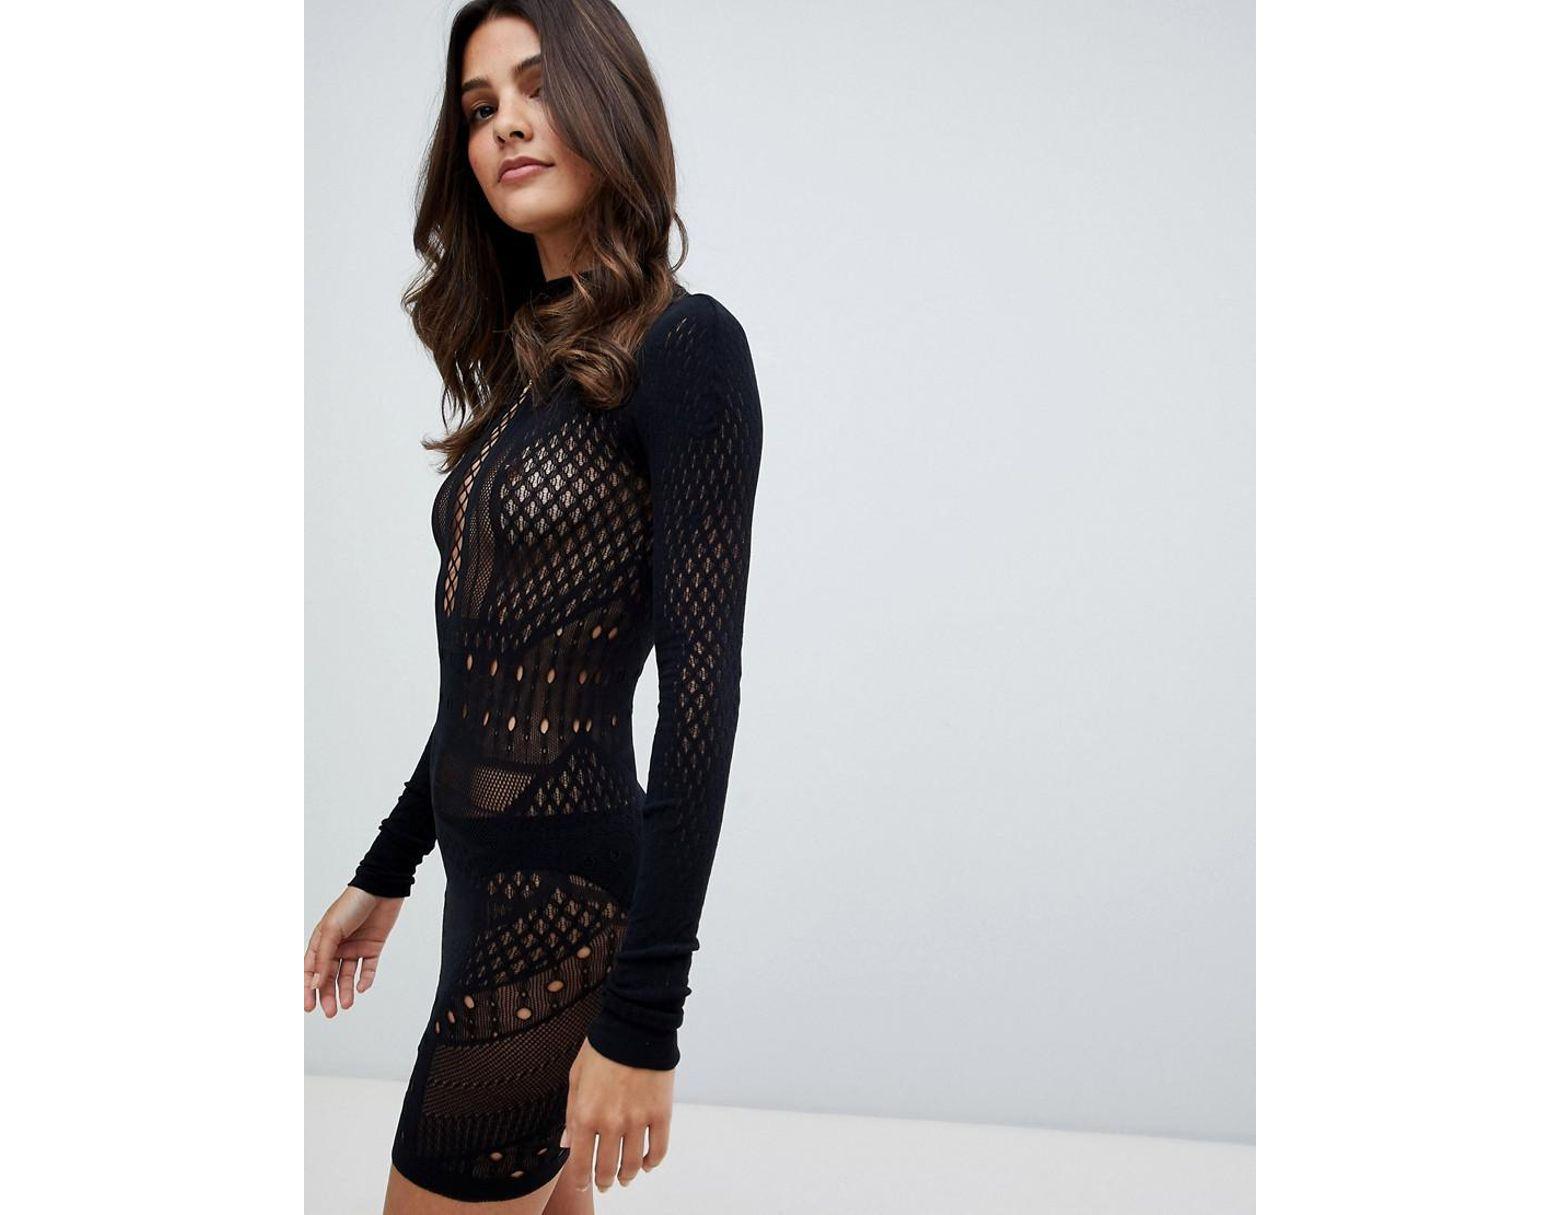 5f70004c1e Ann Summers Janelle Knit Circular Stretch Dress in Black - Lyst